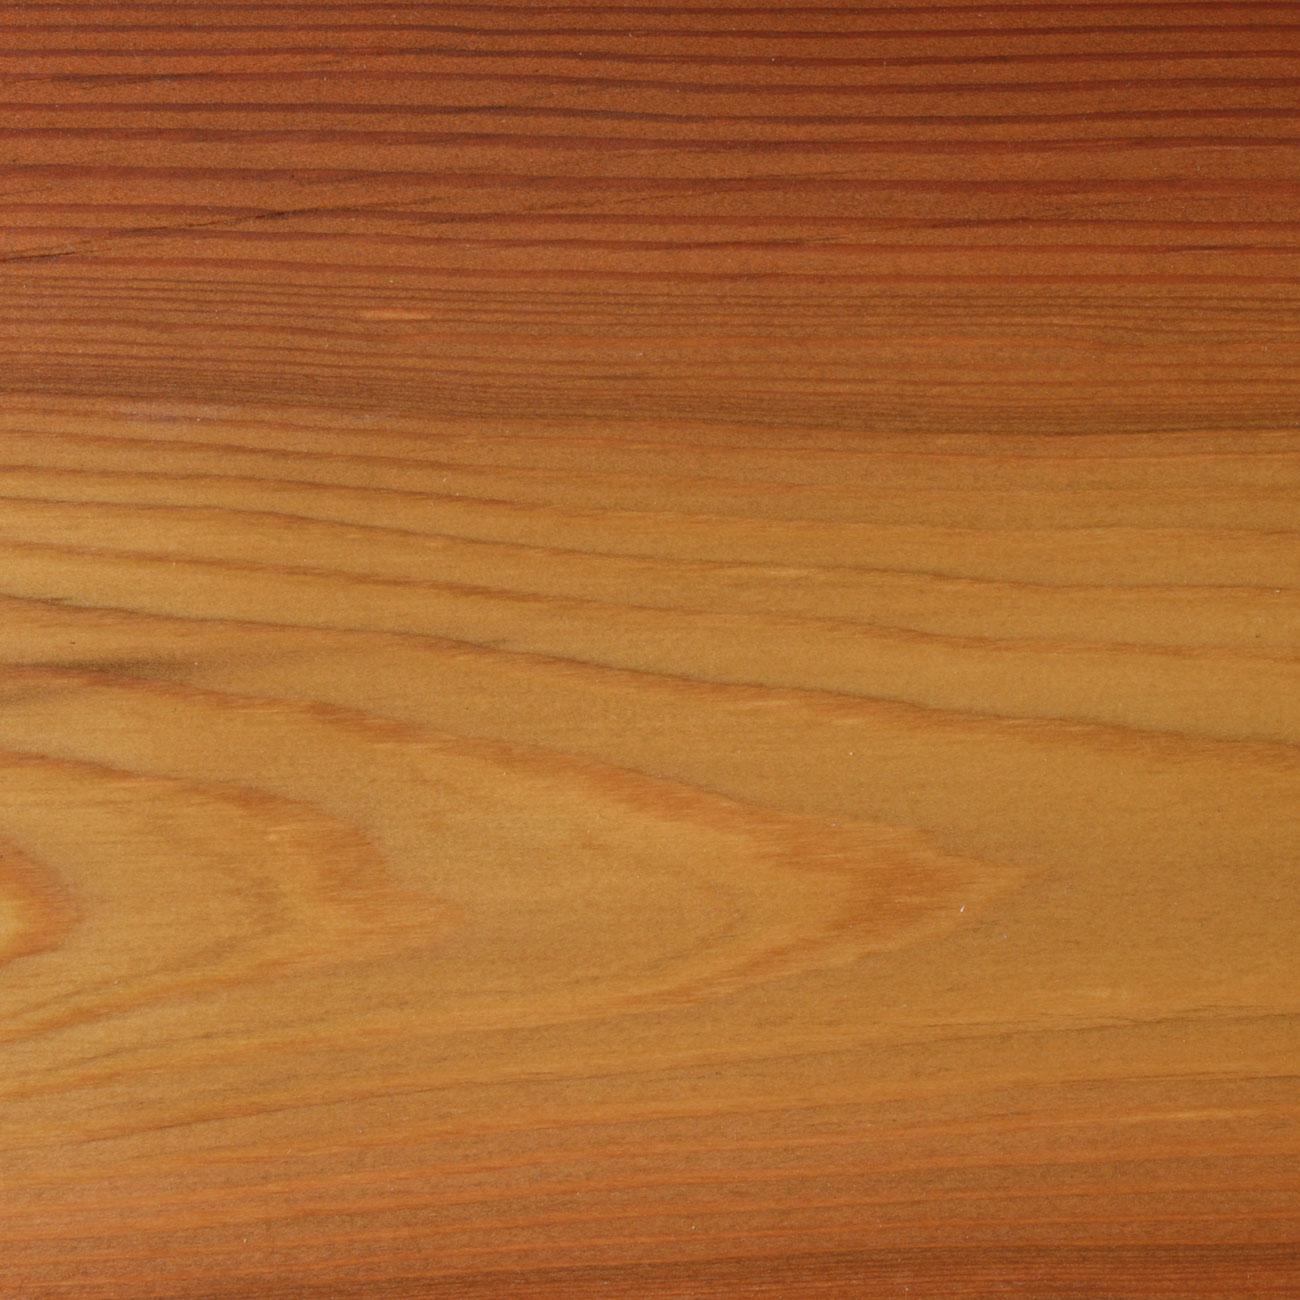 60.Lärche geschliffen, mit Faxe Speziallauge zzgl. 5% Faxe Combicolor hellbraun gelaugt und mit Faxe Holzbodenöl natur geöl